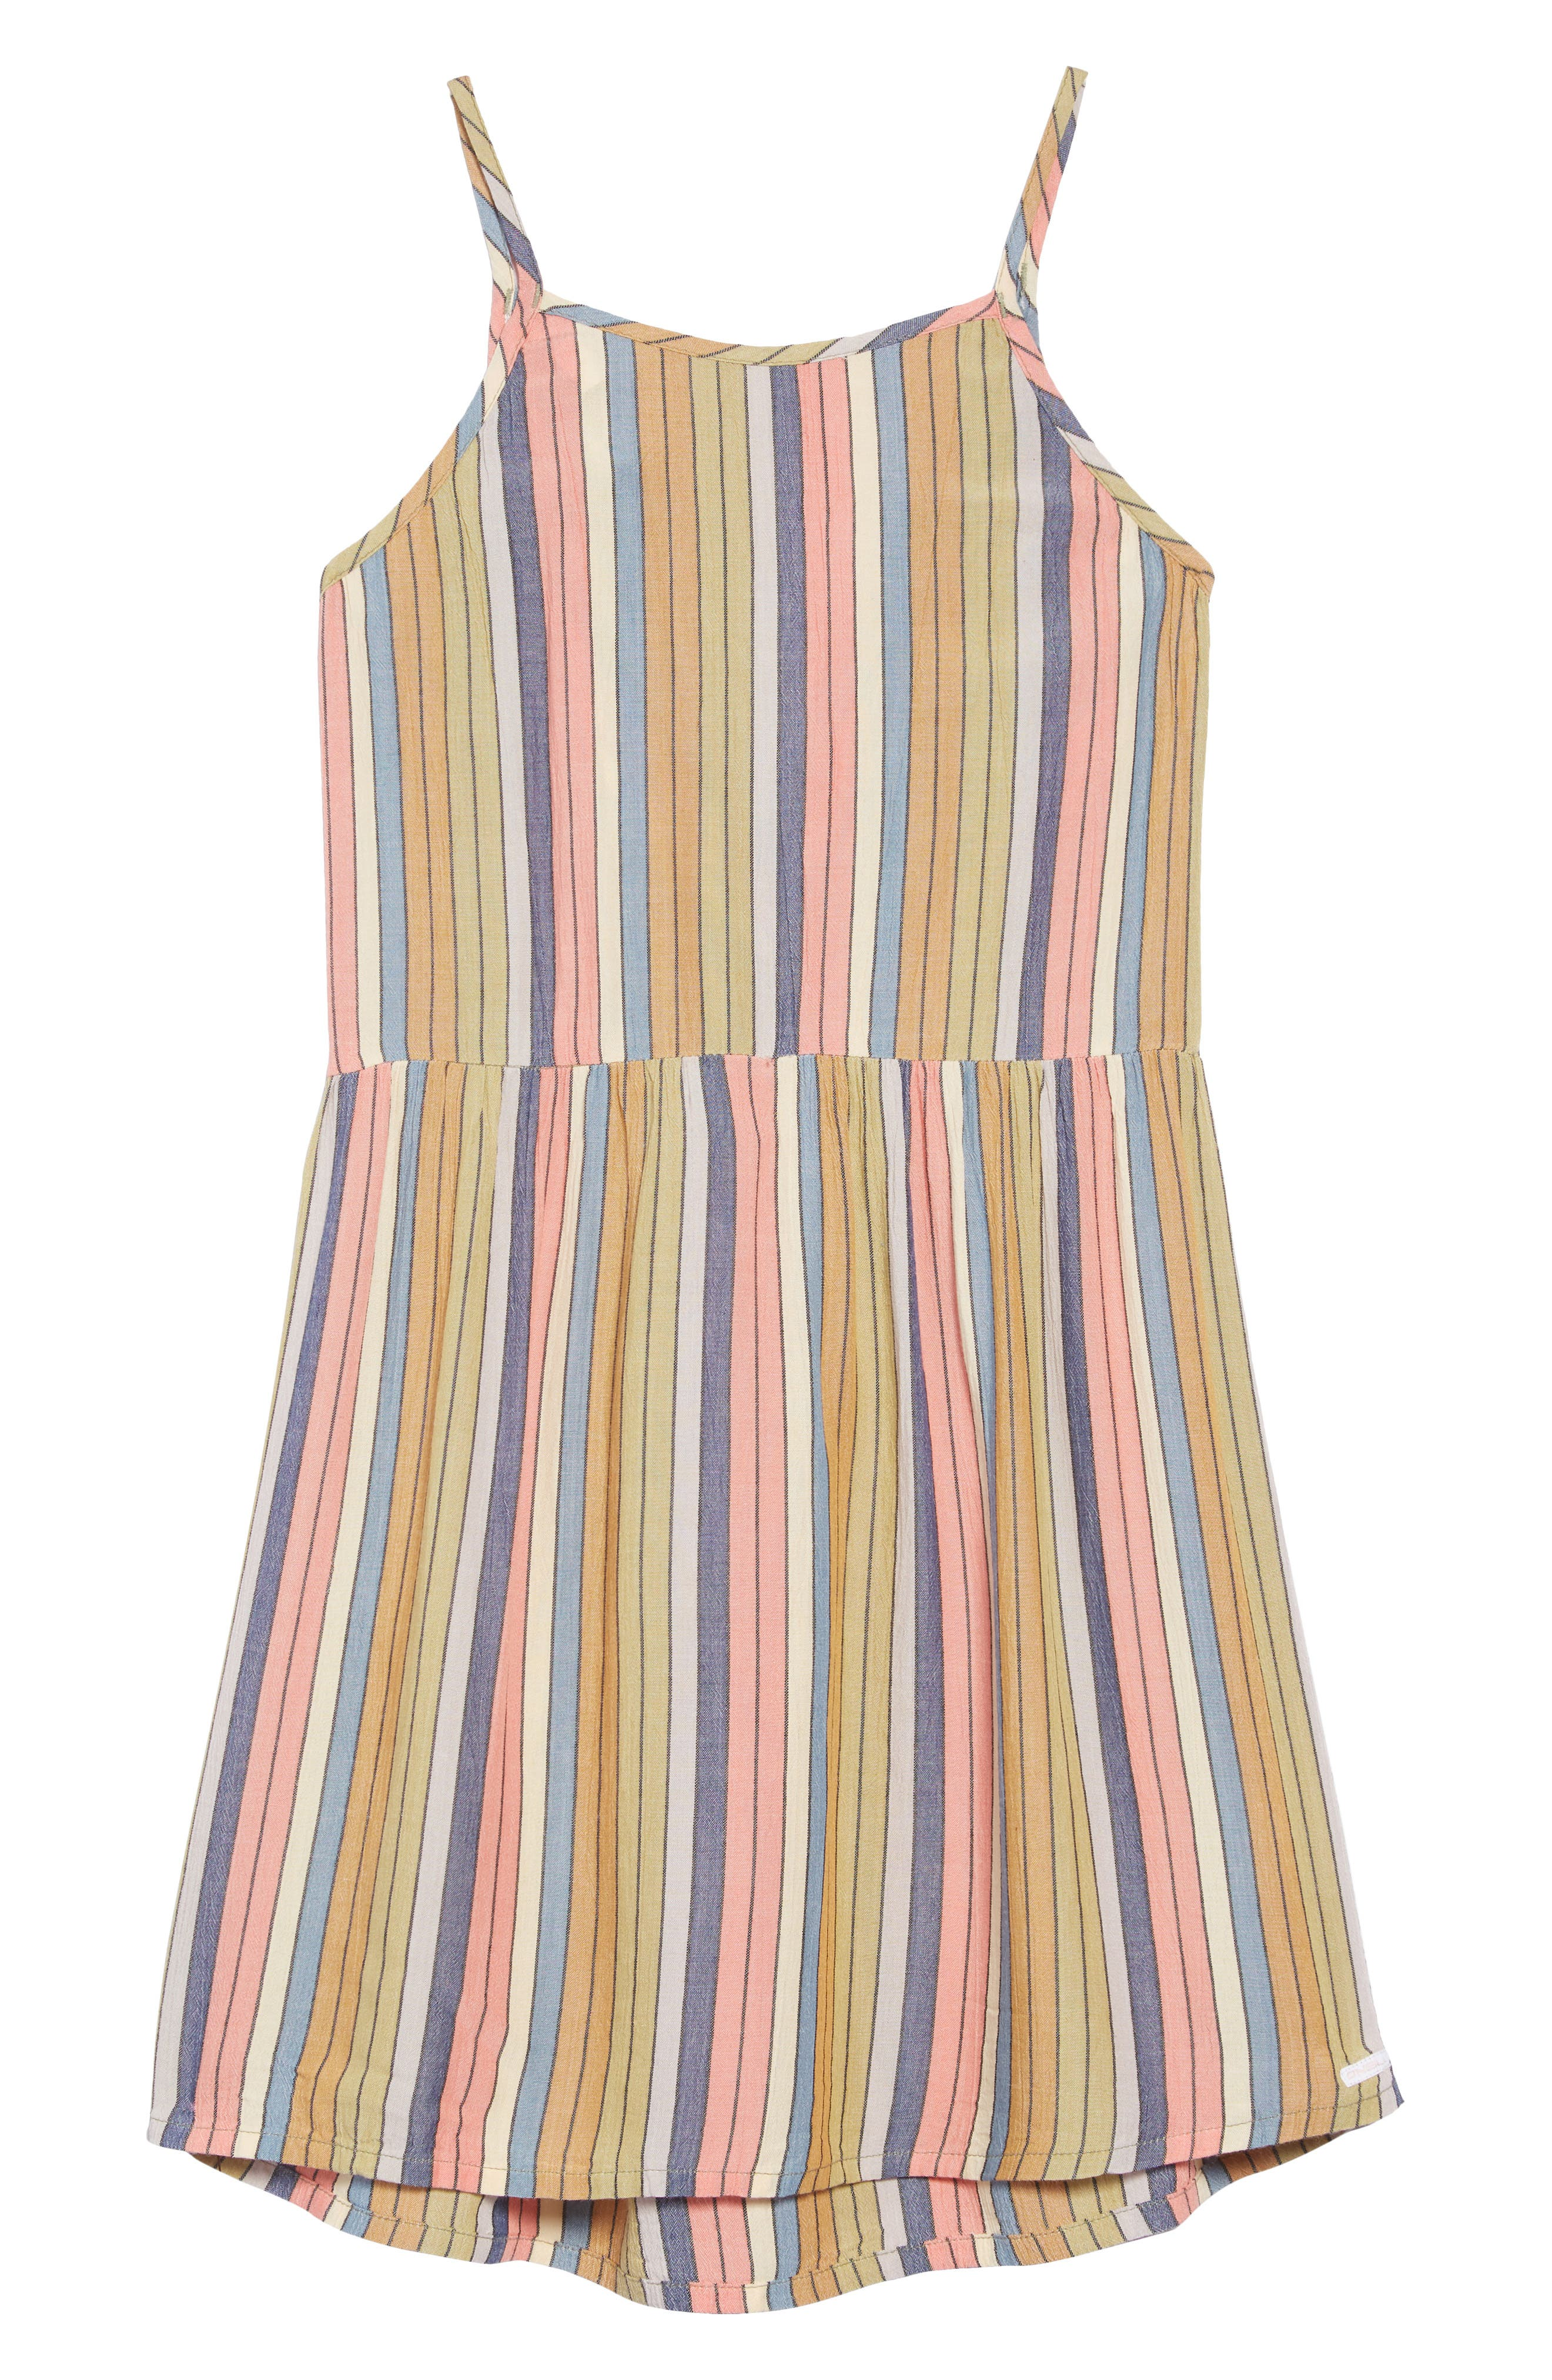 O'NEILL Berlin Stripe Sundress, Main, color, MULTI COLORED